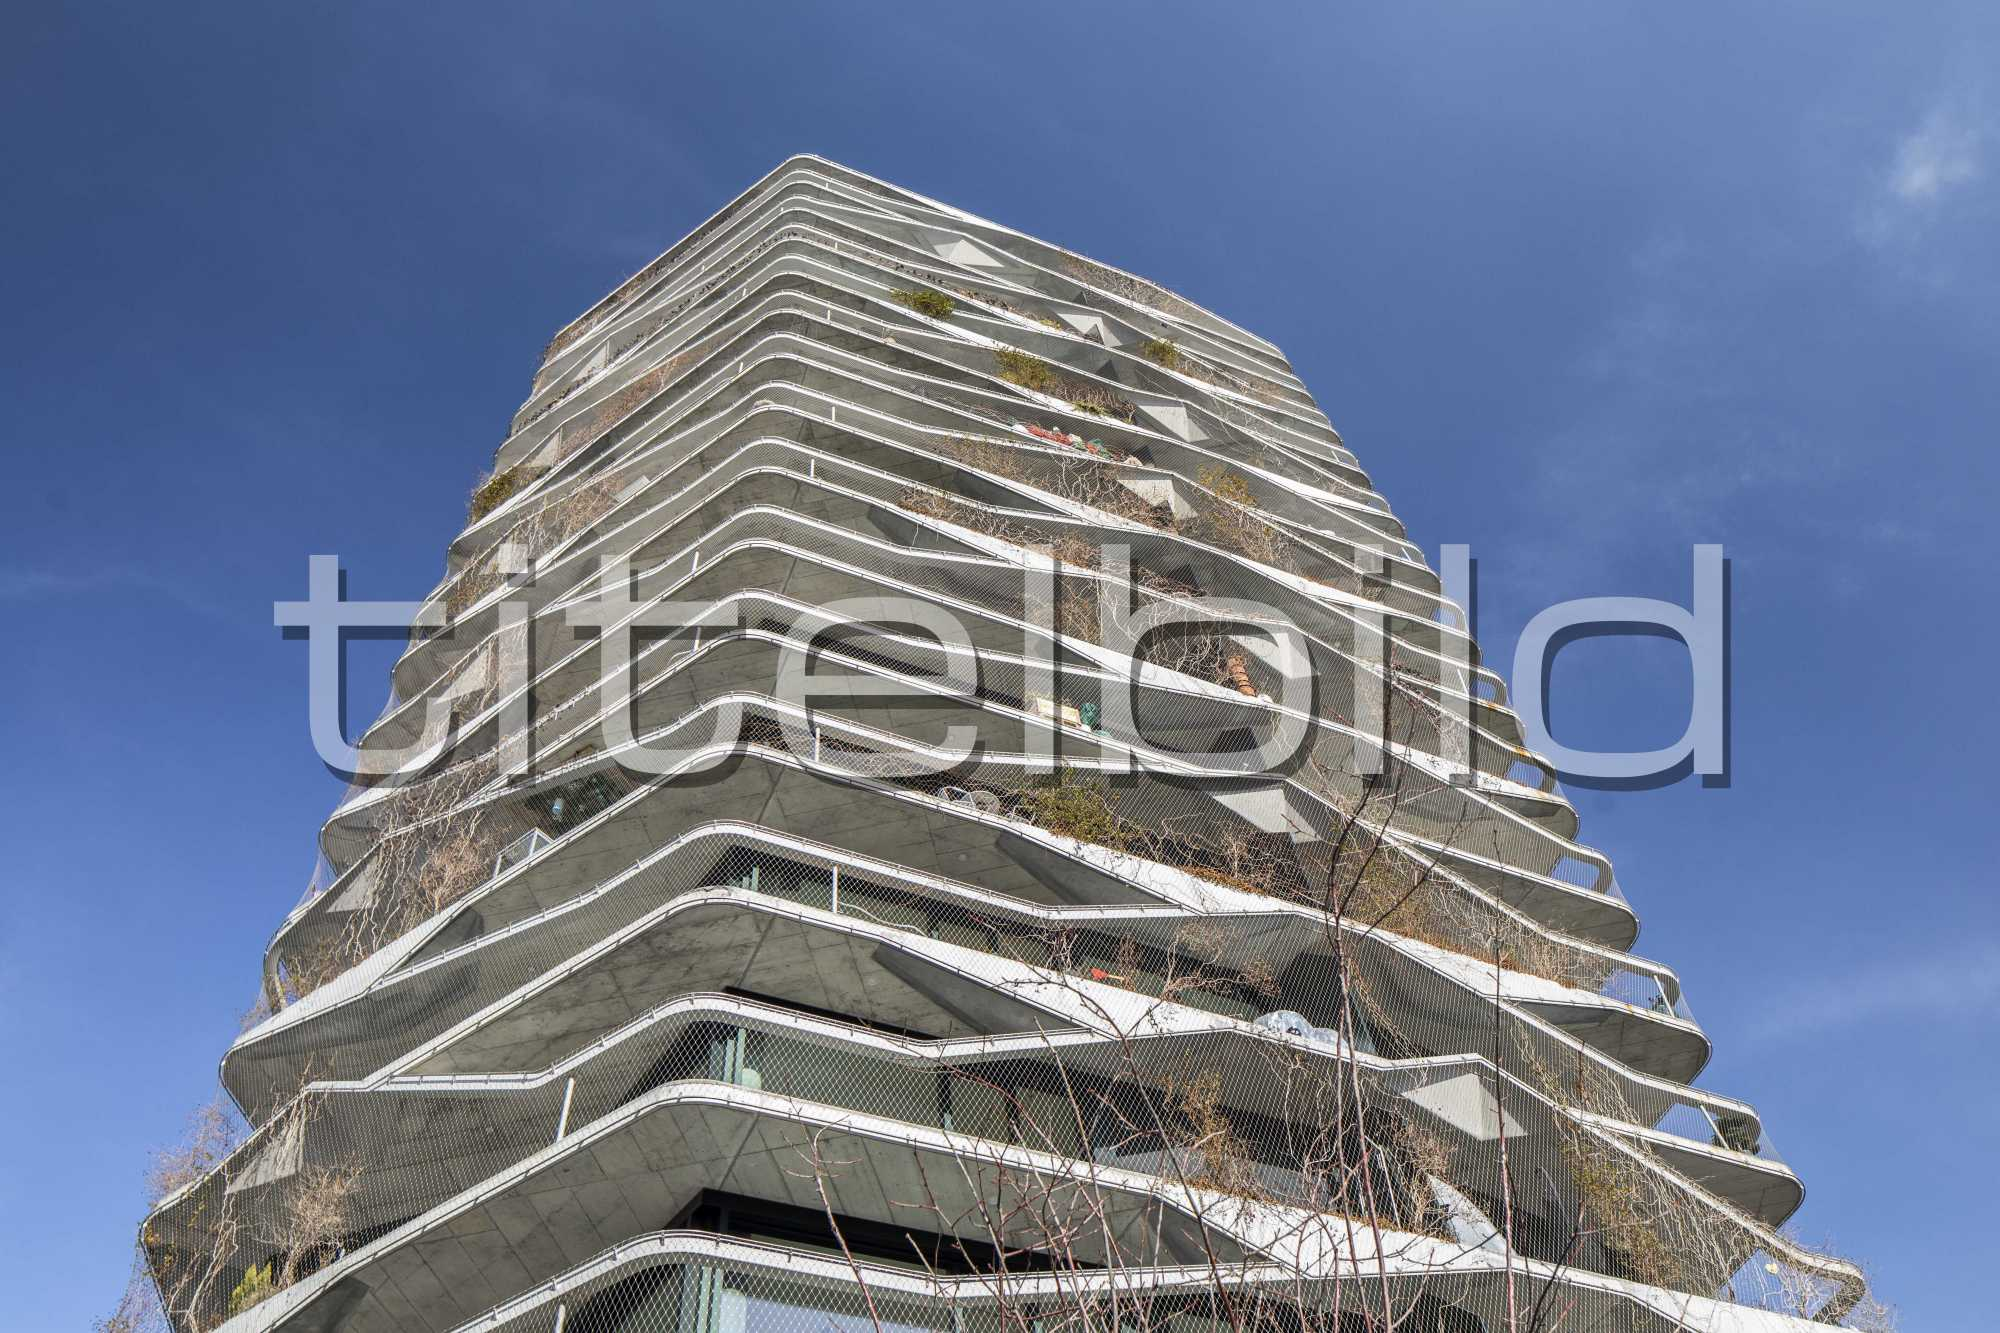 Projektbild-Nr. 3: Garden Tower Bächtelenpark Wabern